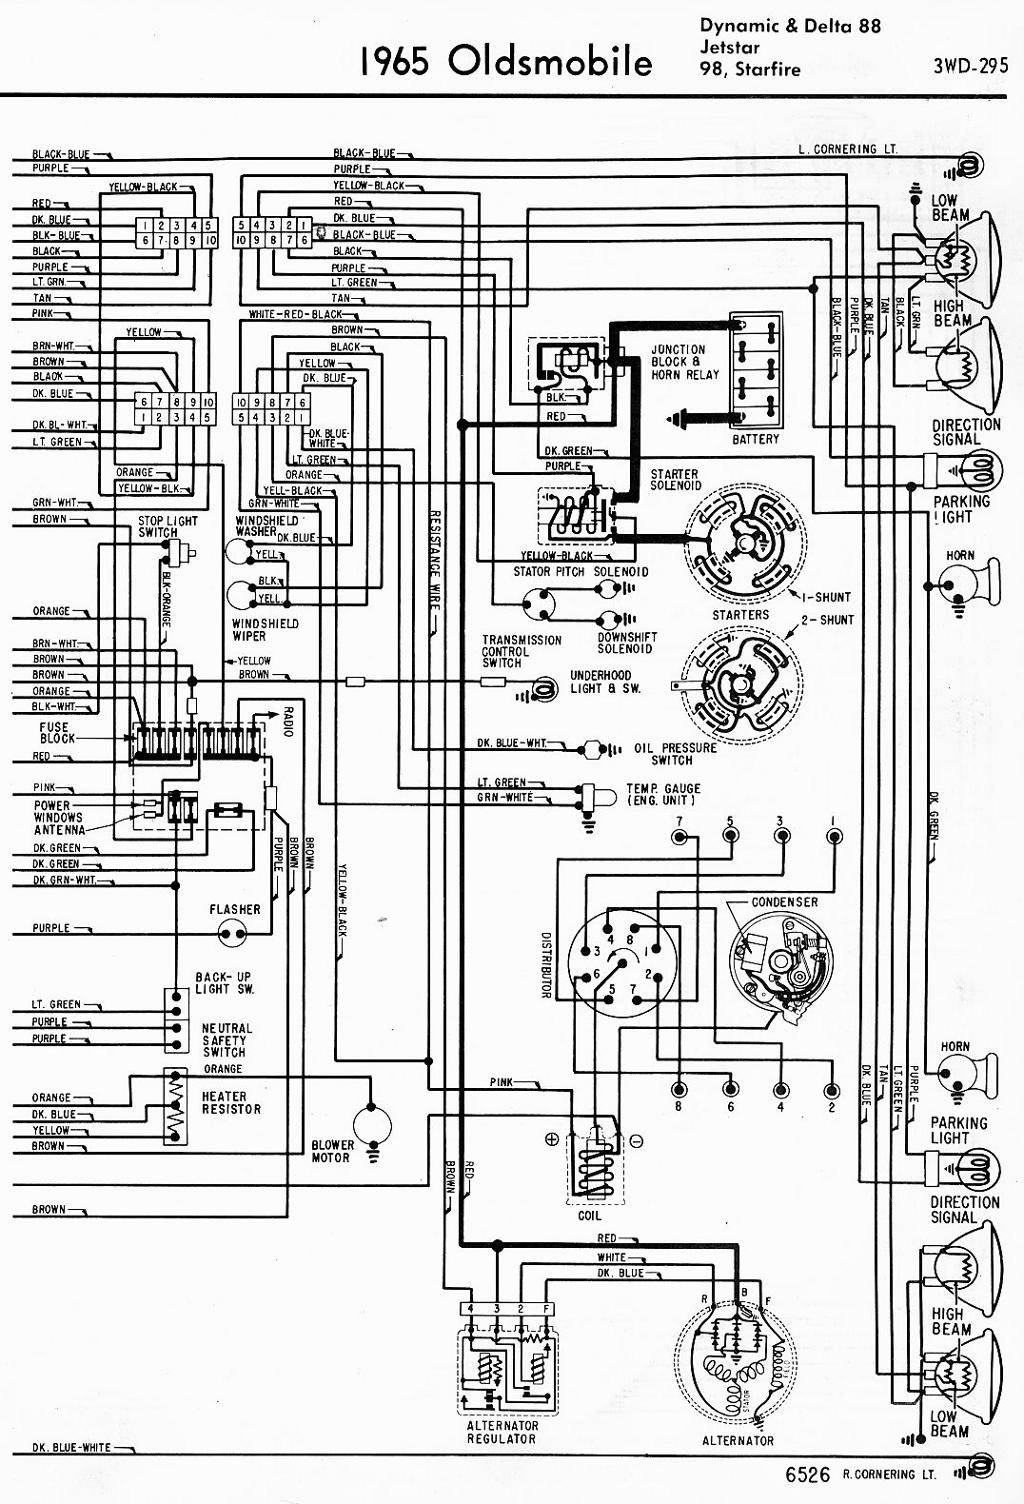 1996 Nissan Pickup Wiring Diagram Free Download Great Installation Hardbody Fuse Versa Stereo Library Rh 32 Skriptoase De Pick Up